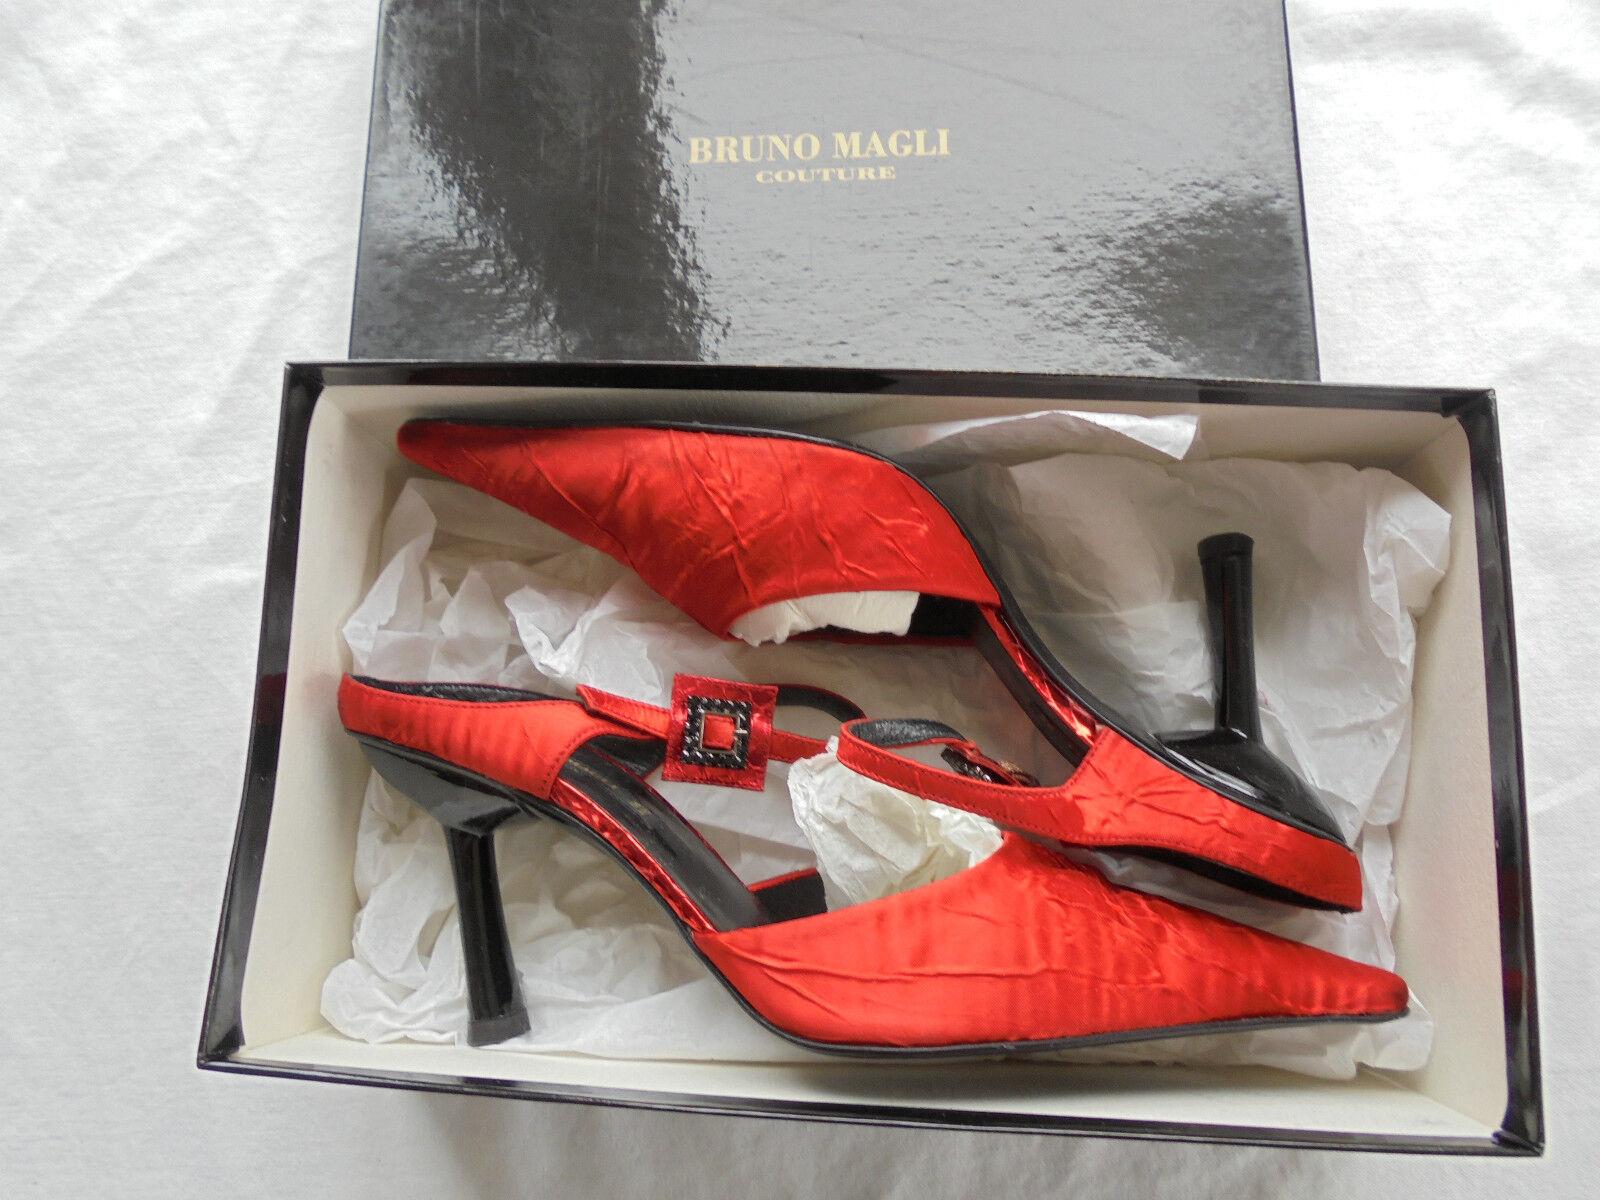 Feine Bruno Magli Satin Pumps NP:  Gr. w NEU Luxus Schuhe Gr.  36 36,5 37 33ff8a